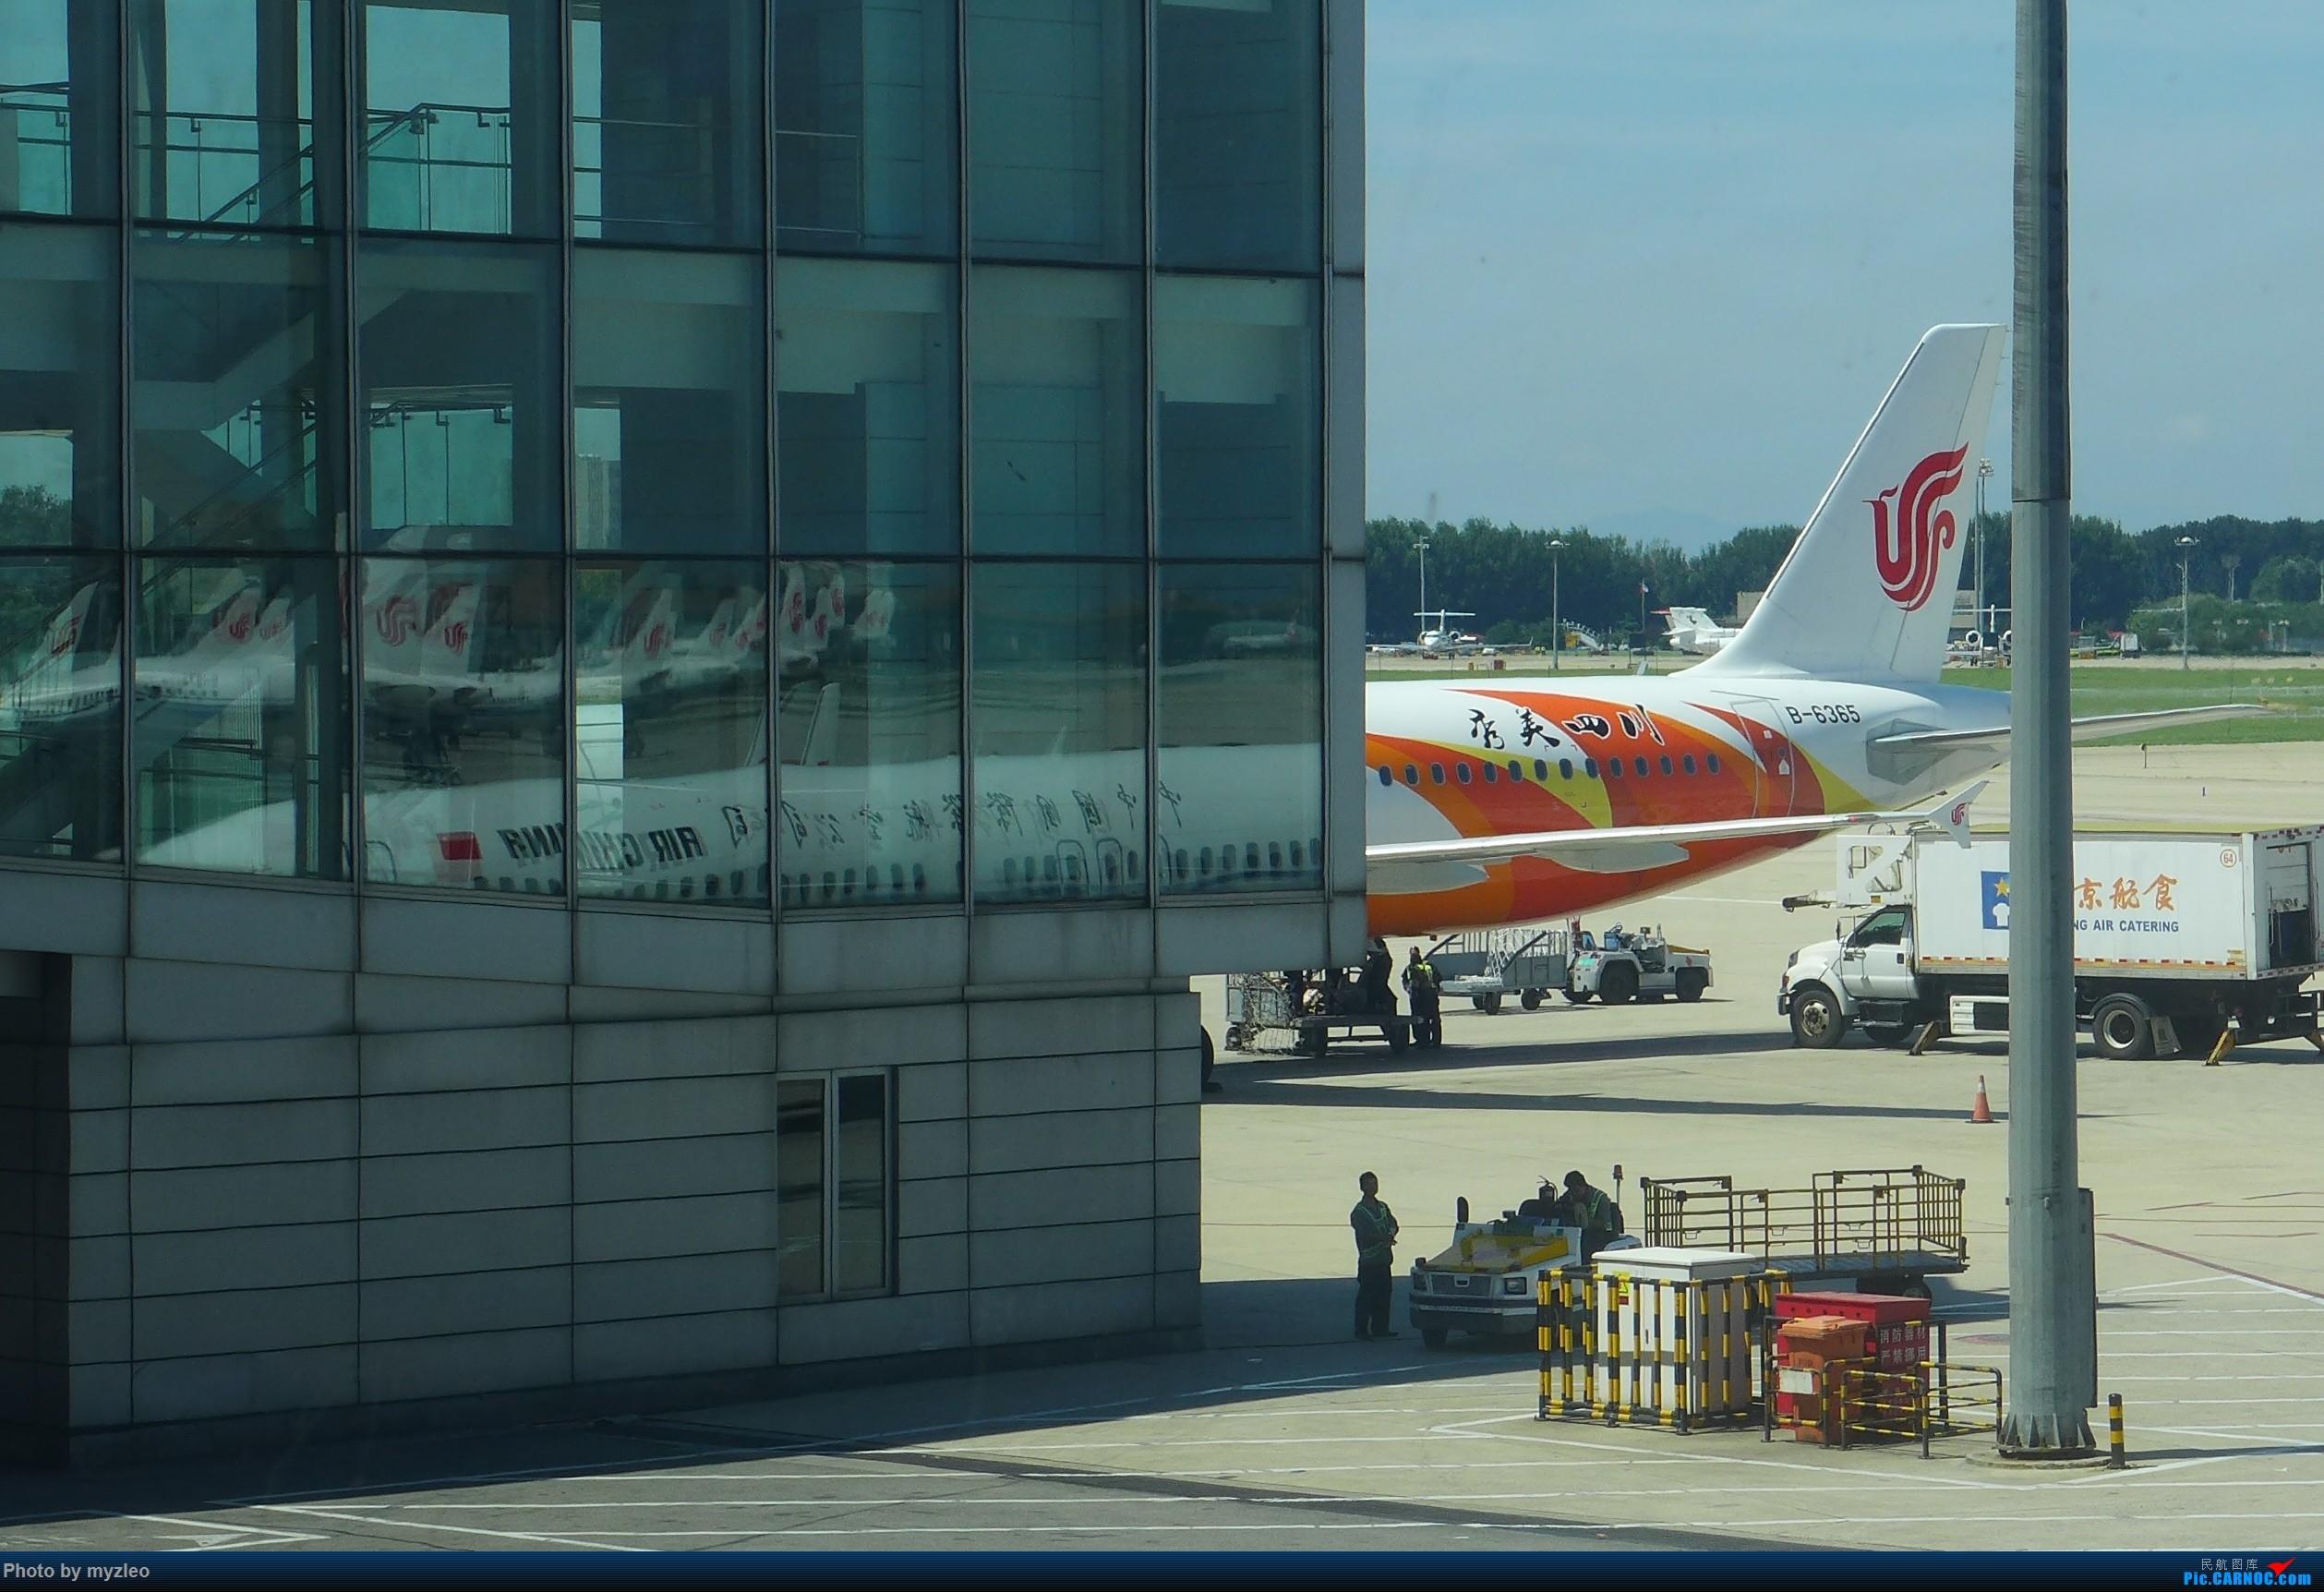 Re:[原创]【myzleo的游记3.1】三访帝都——记一次意外的惊喜,大鹅头初遇,第一次去中关村 AIRBUS A321-200 B-6365 中国北京首都国际机场